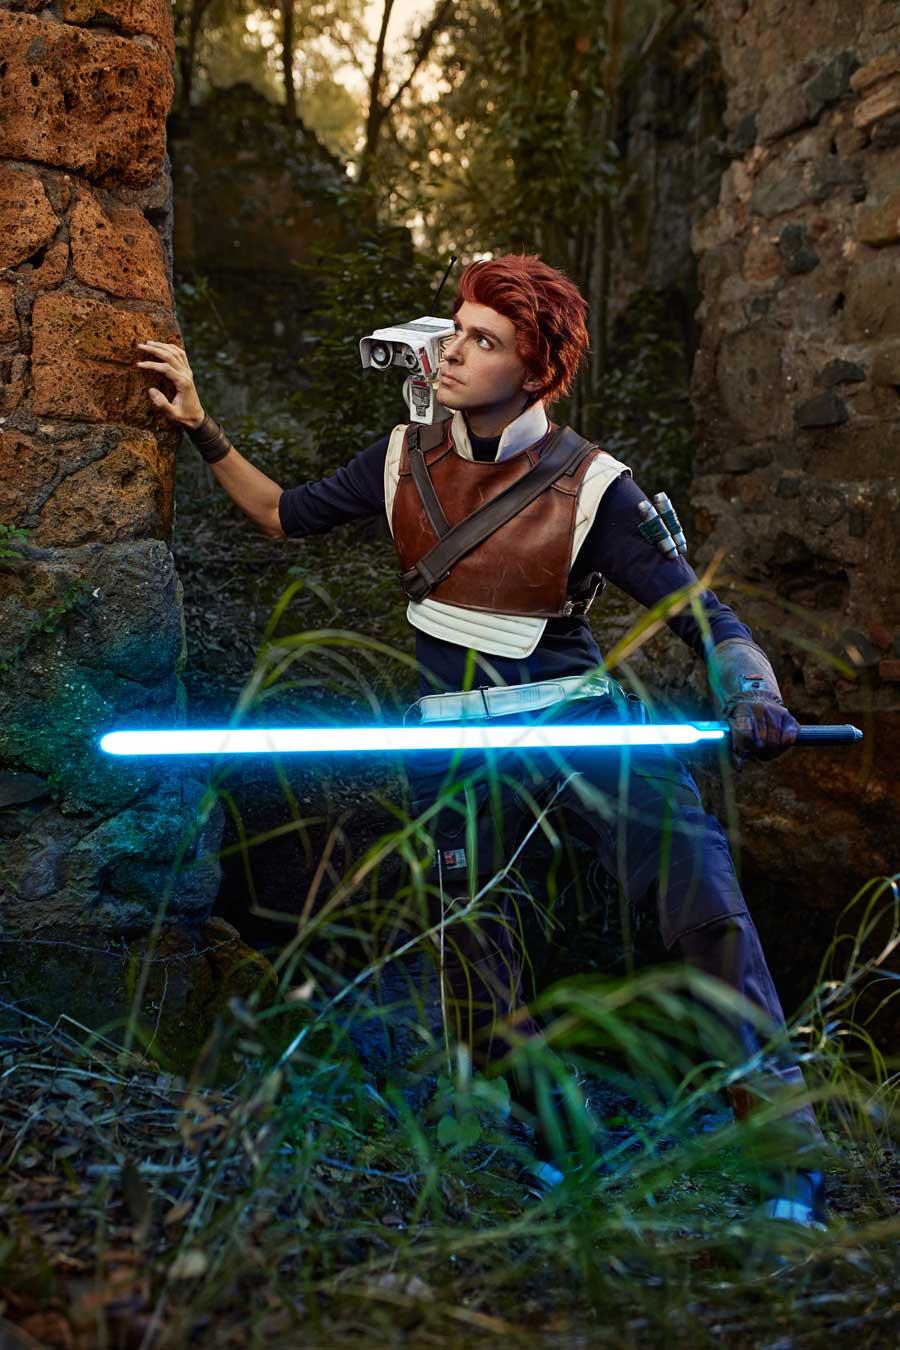 Cosplaying as Cal Kestis from Star Wars Jedi Fallen Order